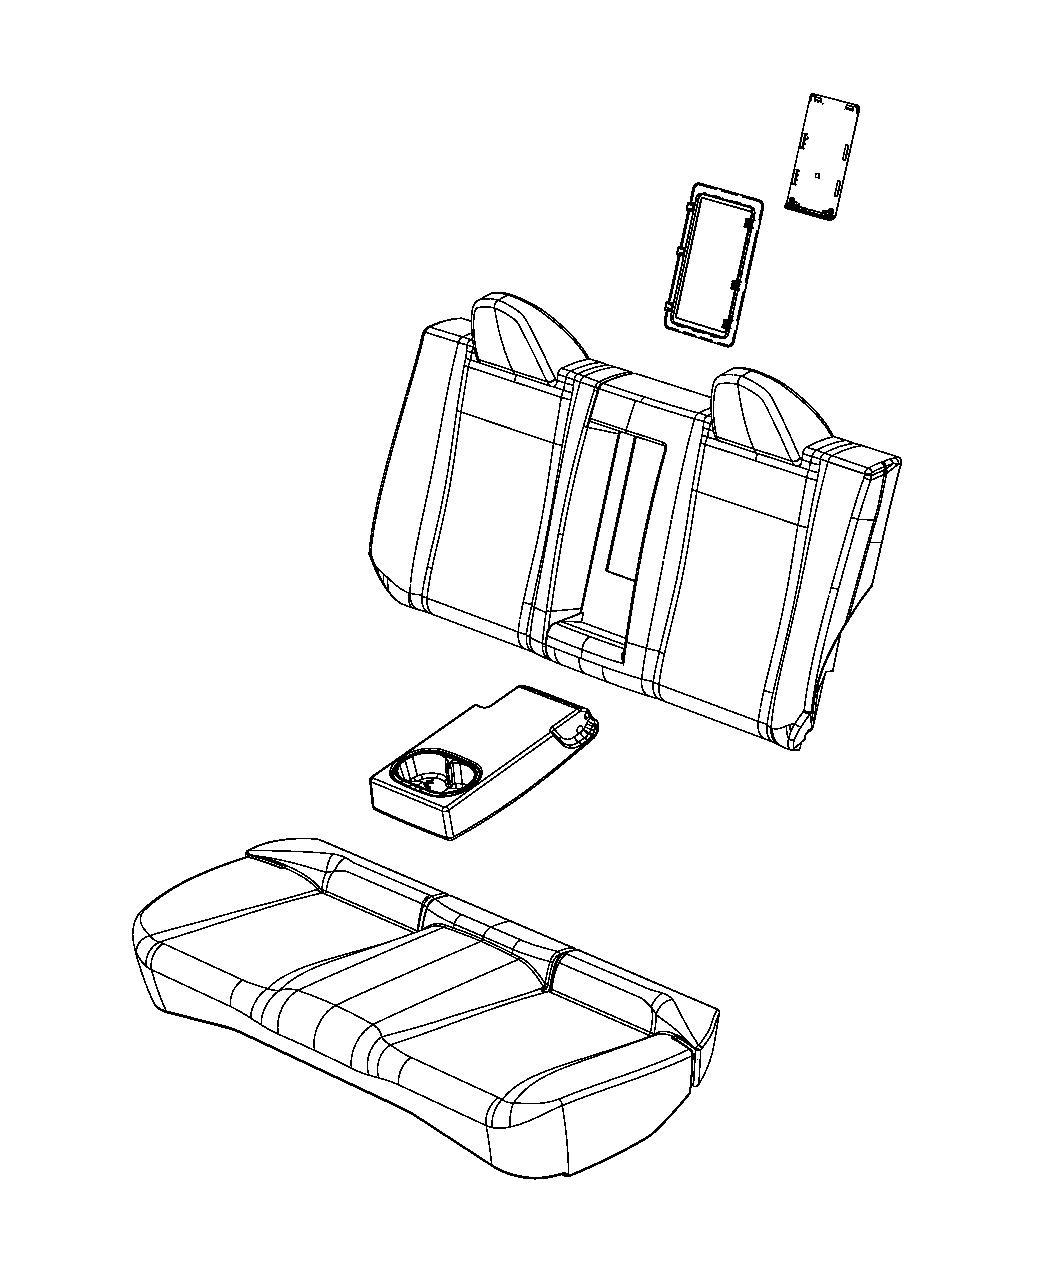 Dodge Avenger Panel Seat Back Rear Rear Seat Back Trim